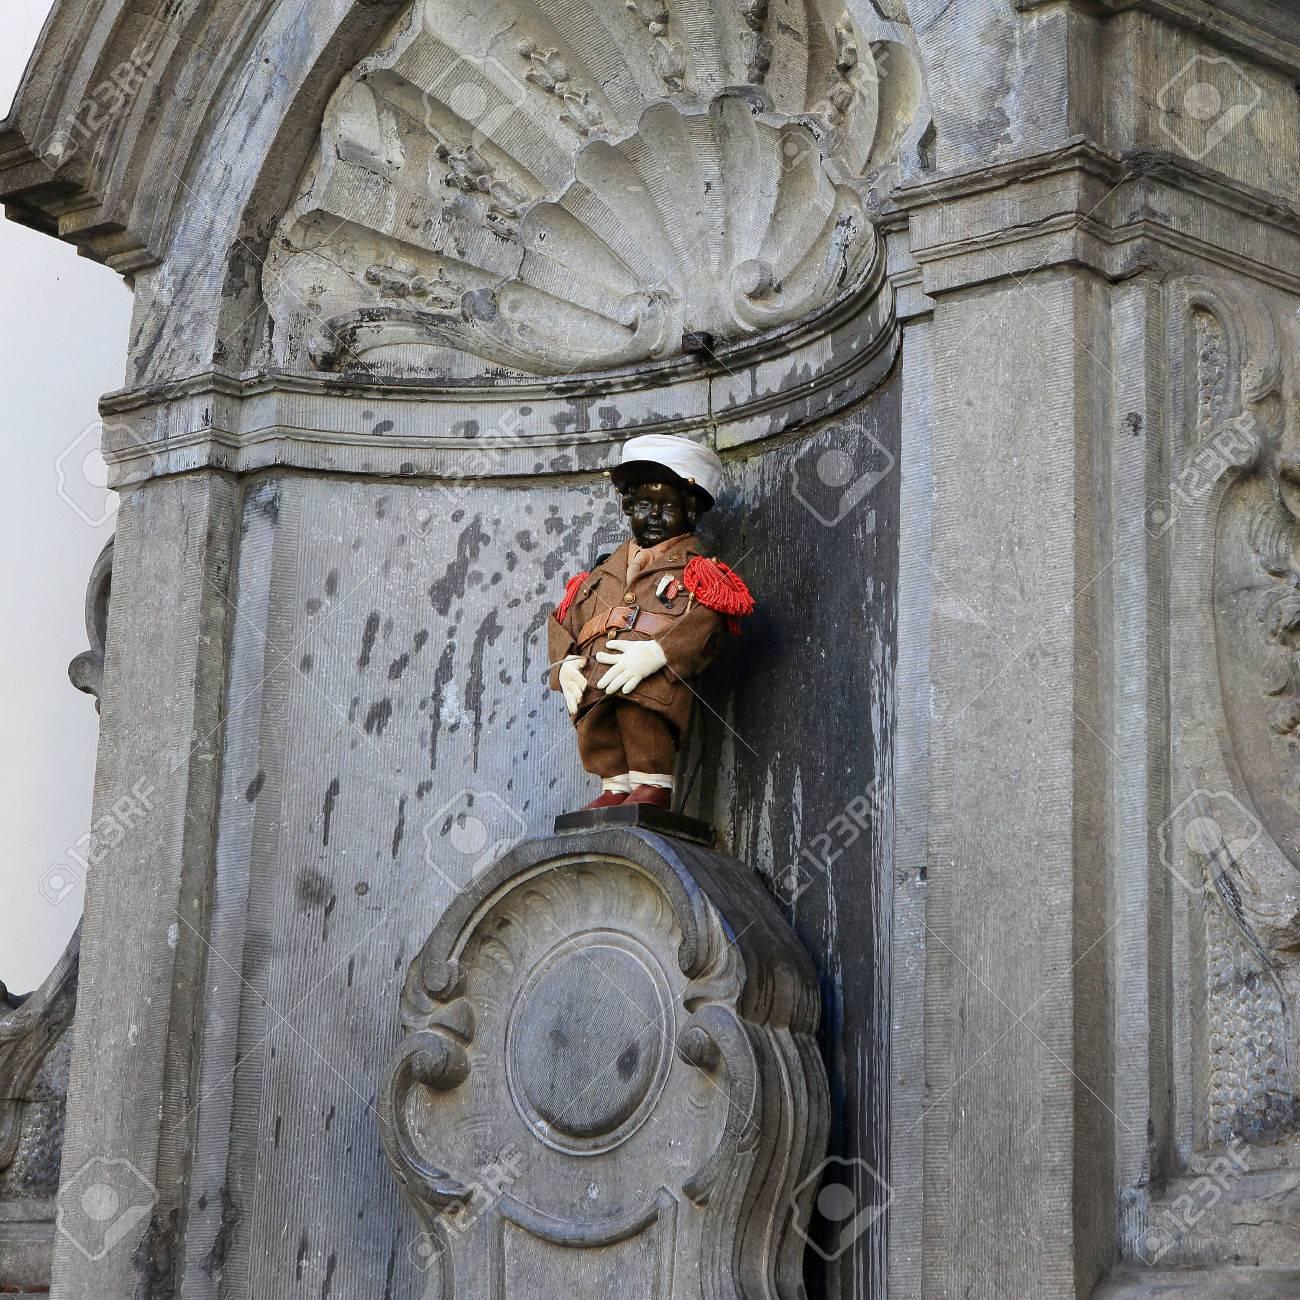 BRUSSELS, BELGIUM - April 18: Manneken Pis statue in Brussels. Statue of a